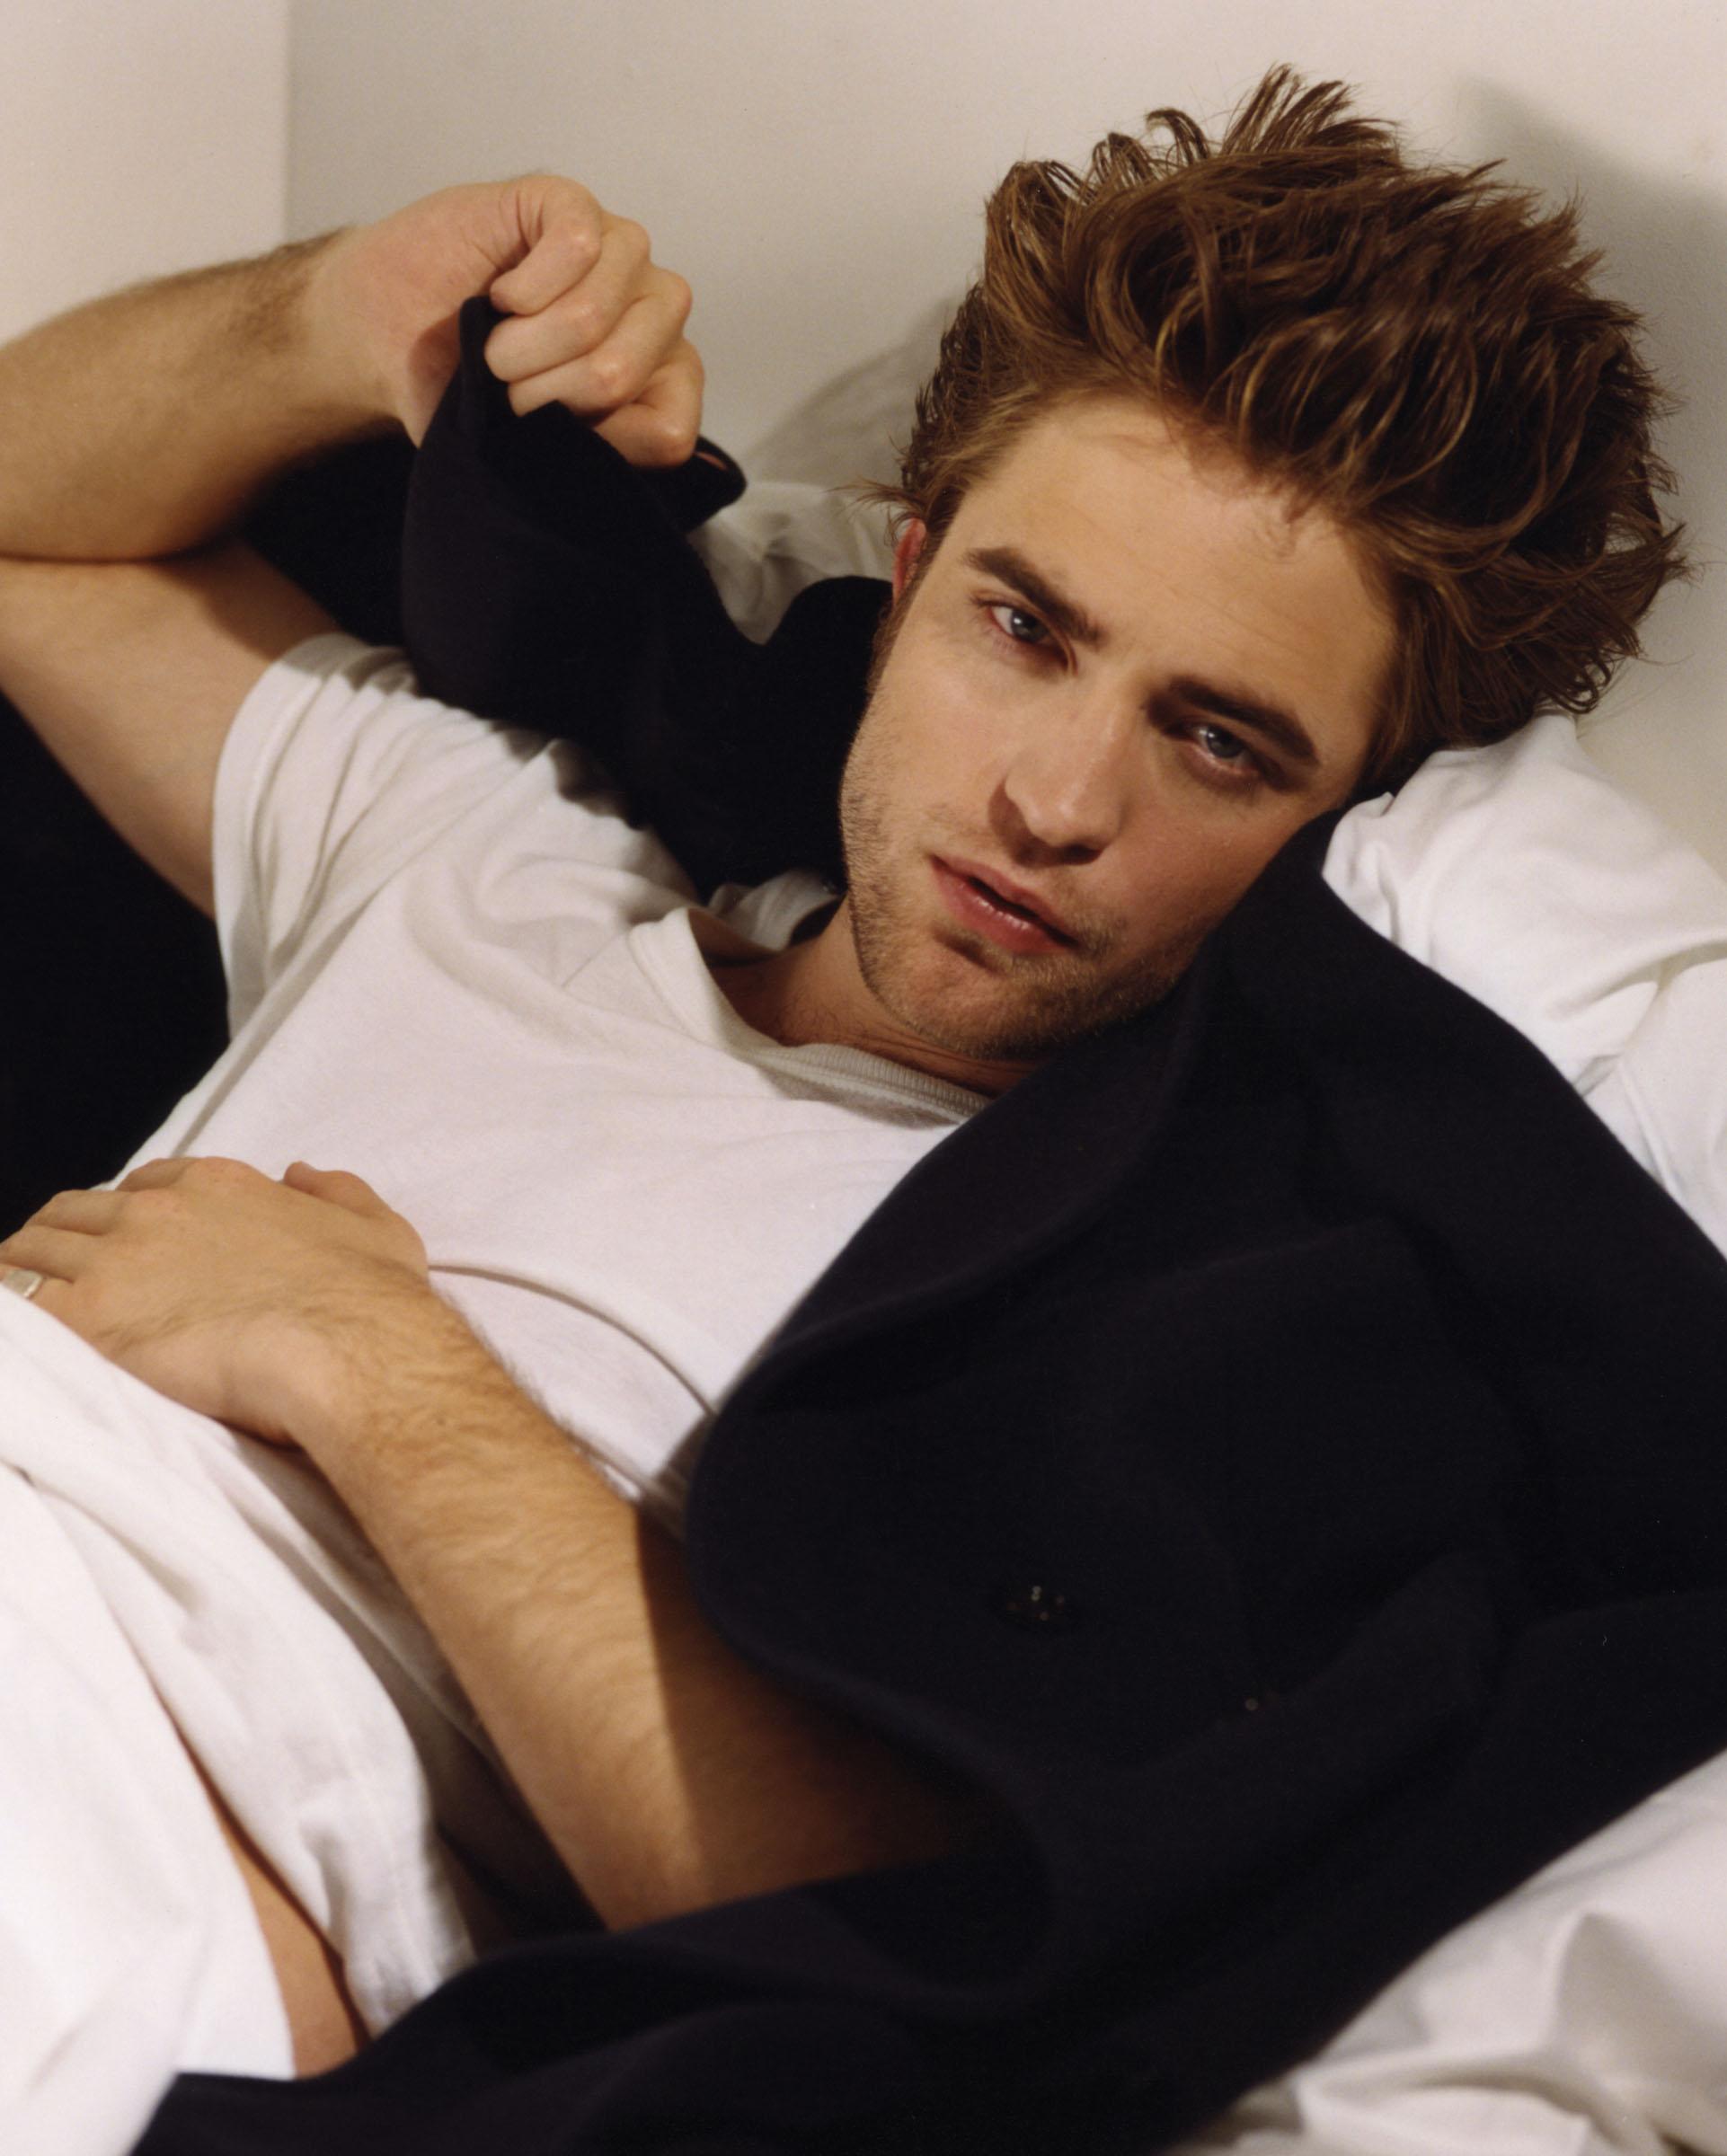 Robert Pattinson: Old Robert Pattinson Outtakes Now In HQ